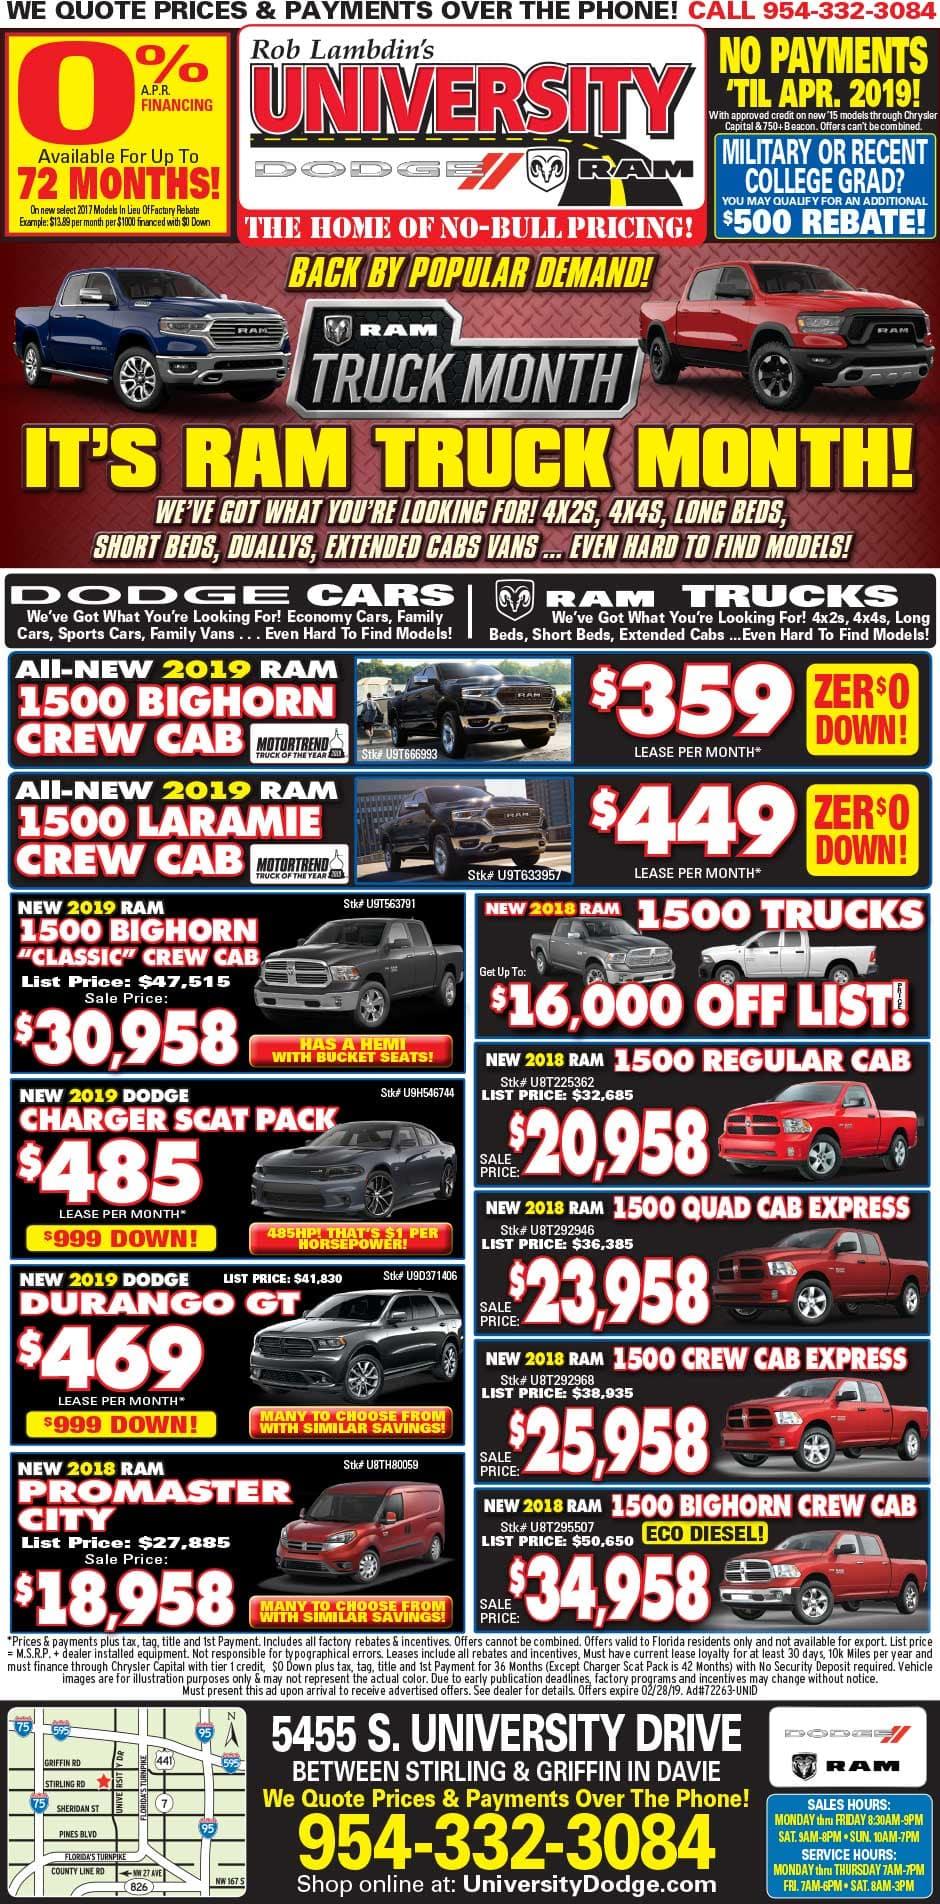 University Dodge Ram Davie - Weekly Specials!